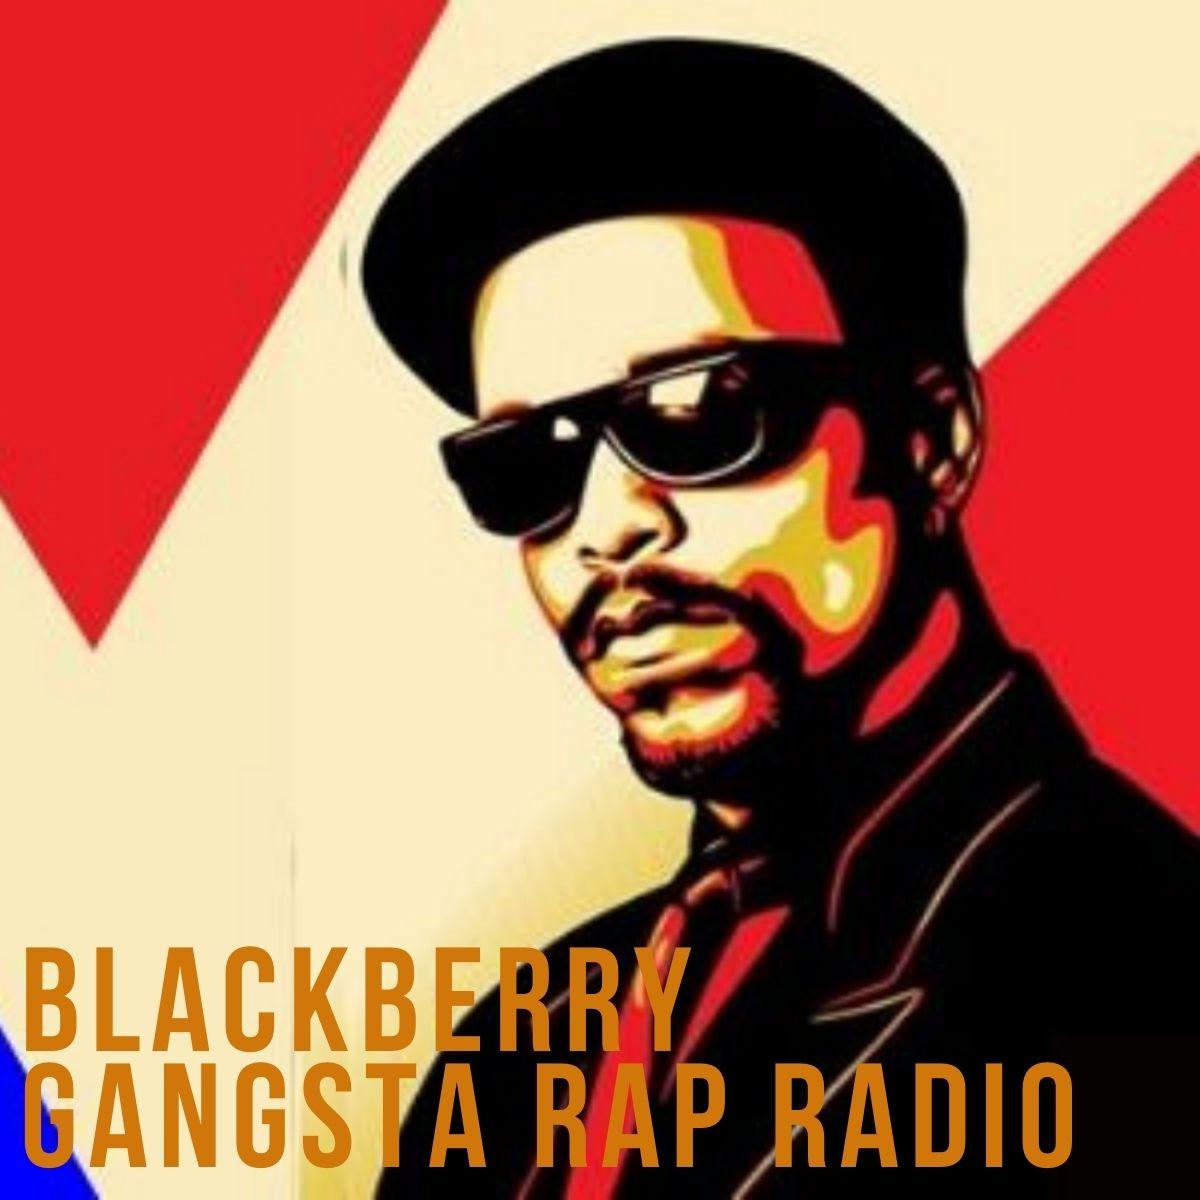 BlackBerry Gangsta Rap Radio